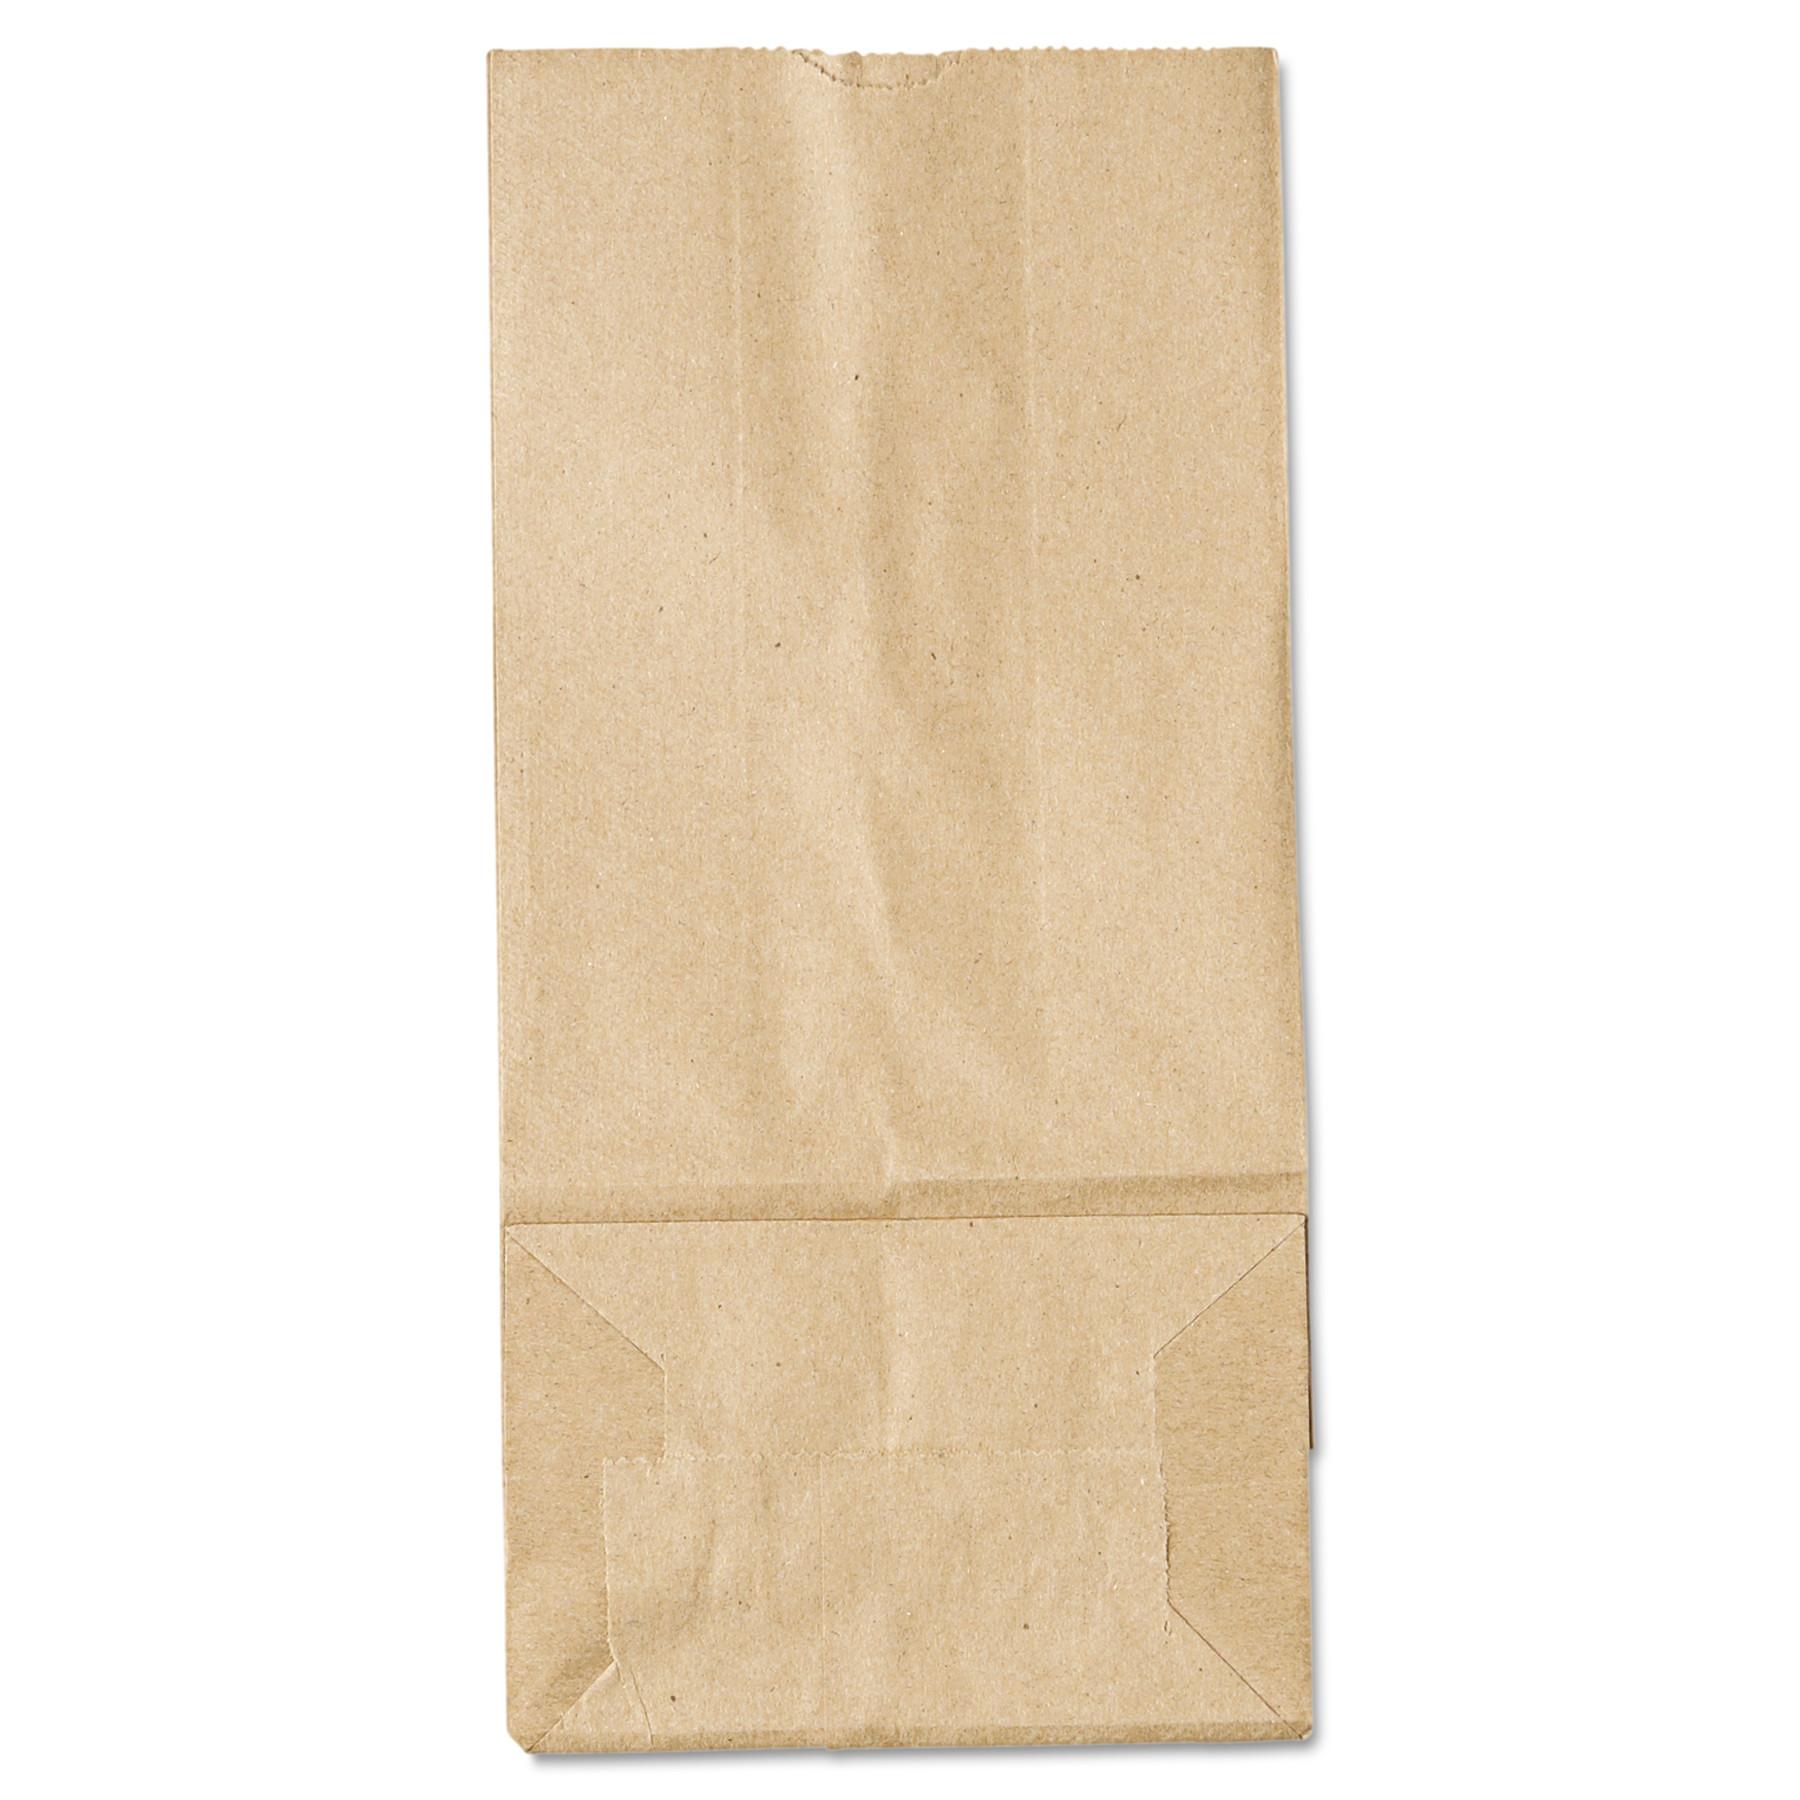 General #5 Paper Grocery Bag, 35lb Kraft, Standard 5 1/4 x 3 7/16 x 10 15/16, 500 bags